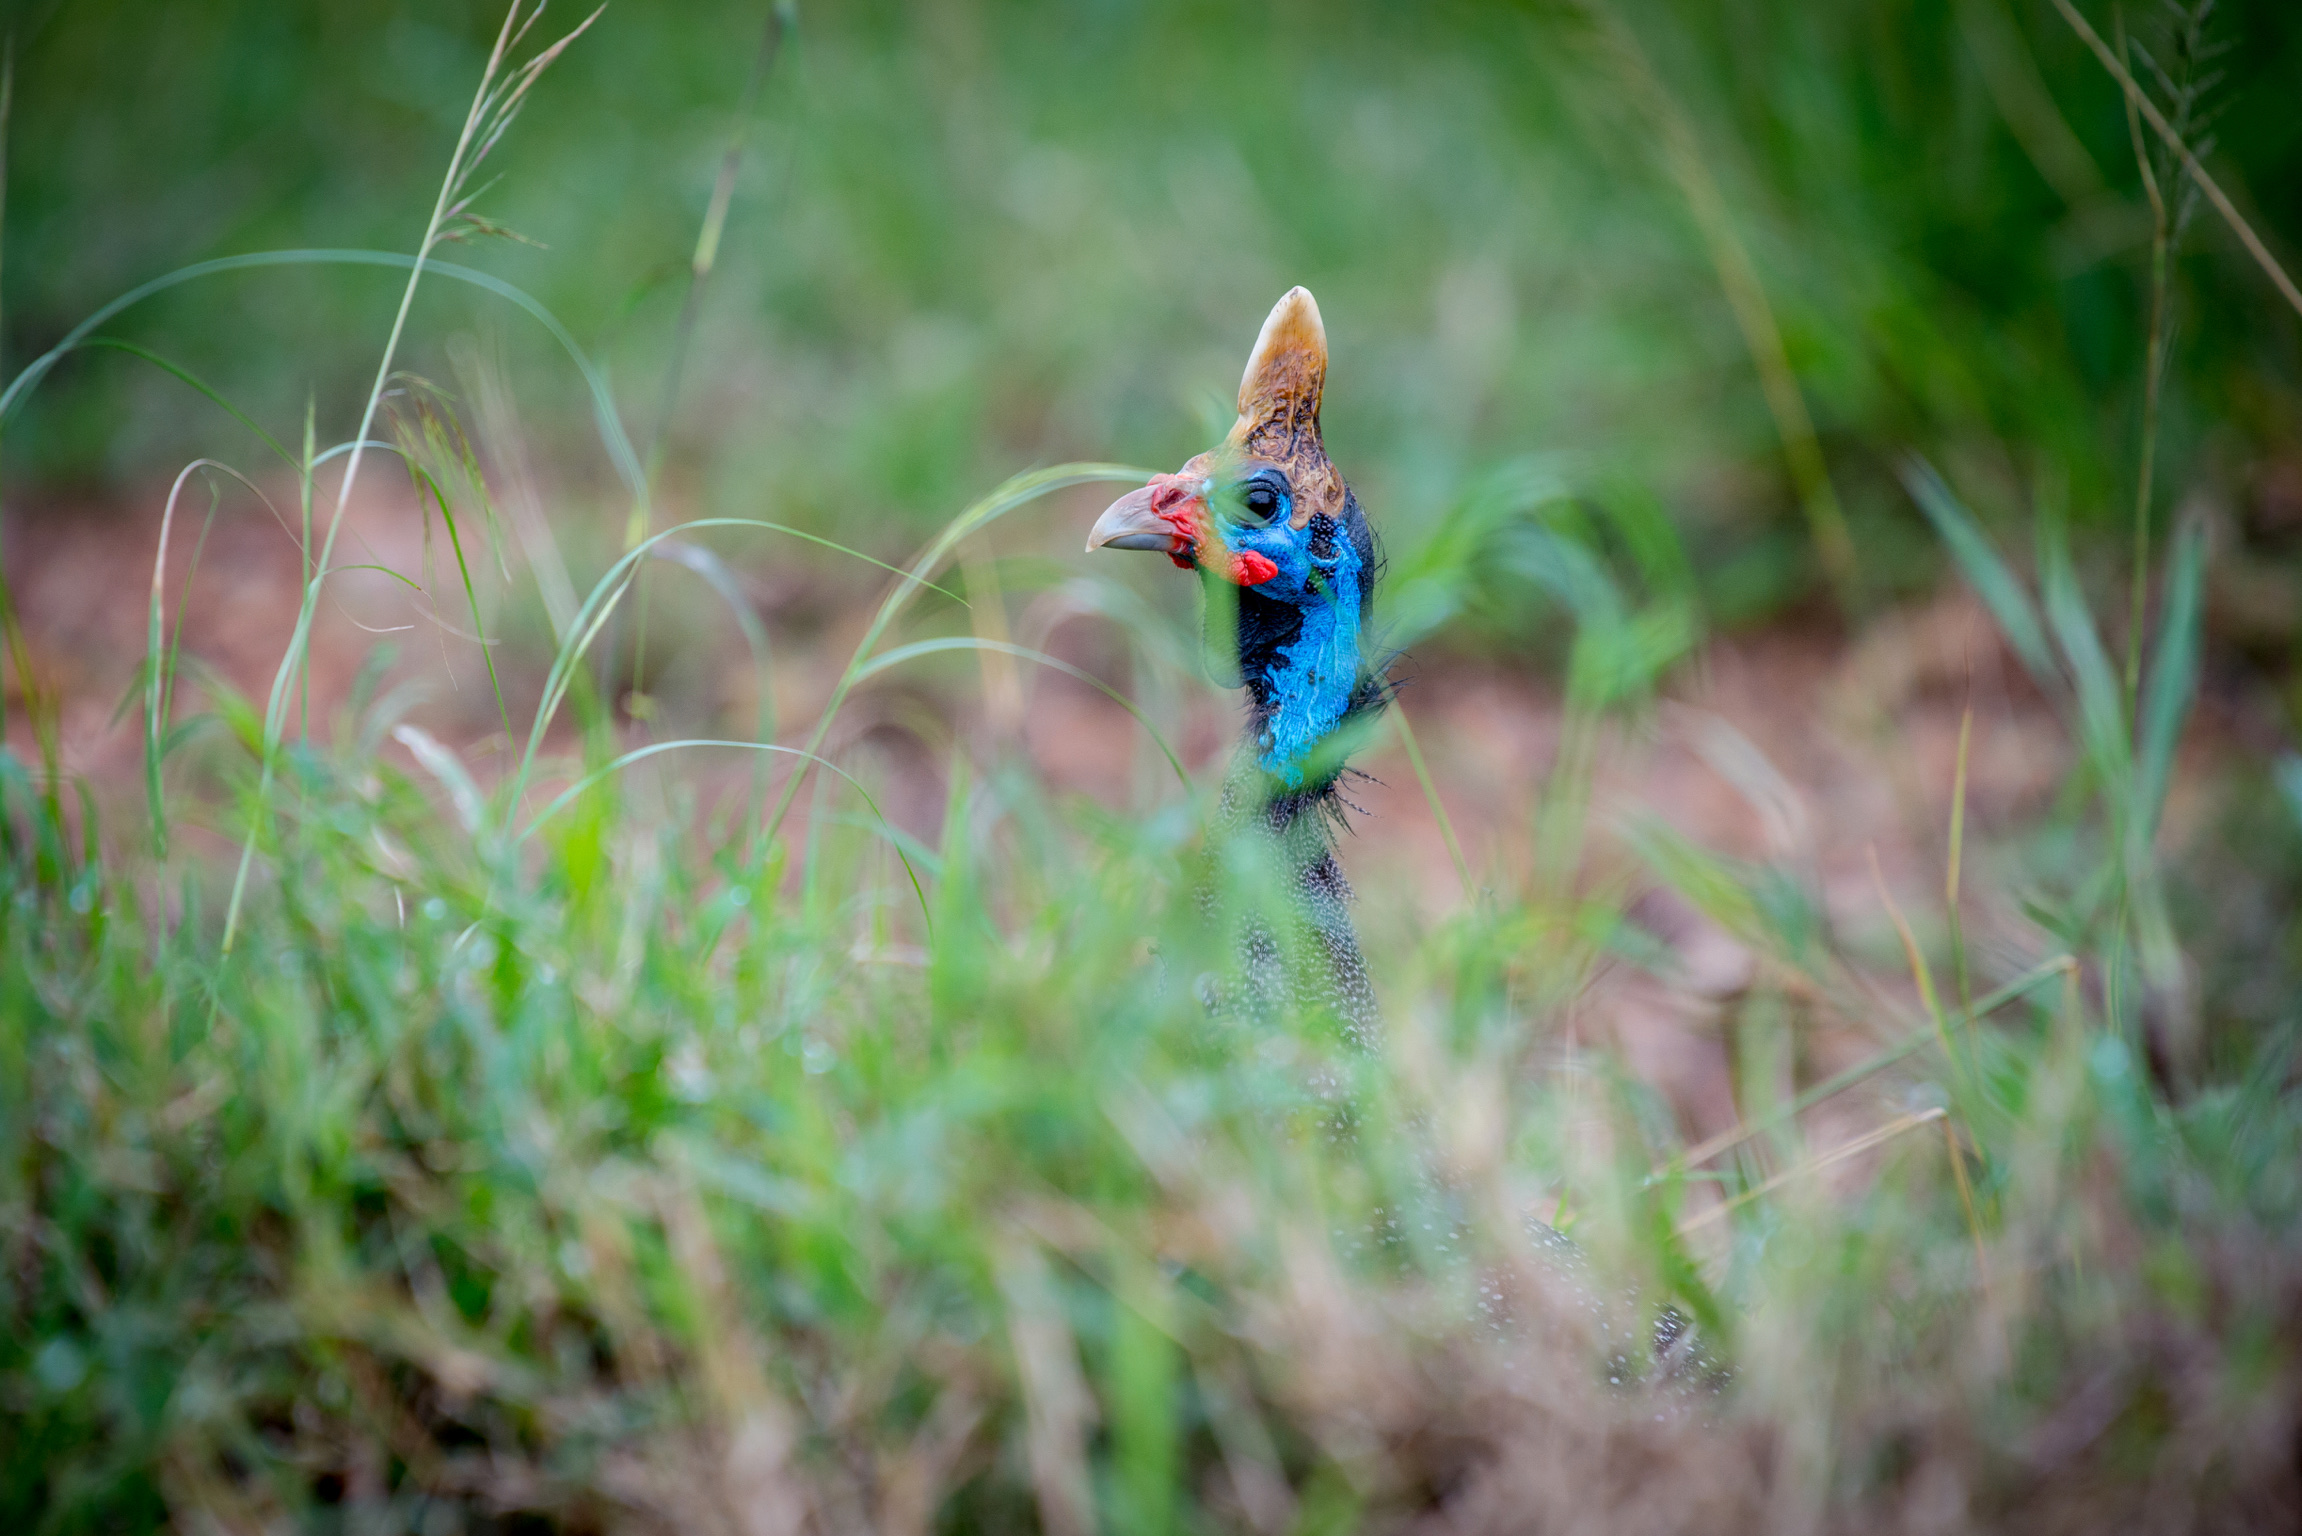 Kenya 2018 - Safari Day 4-85.jpg